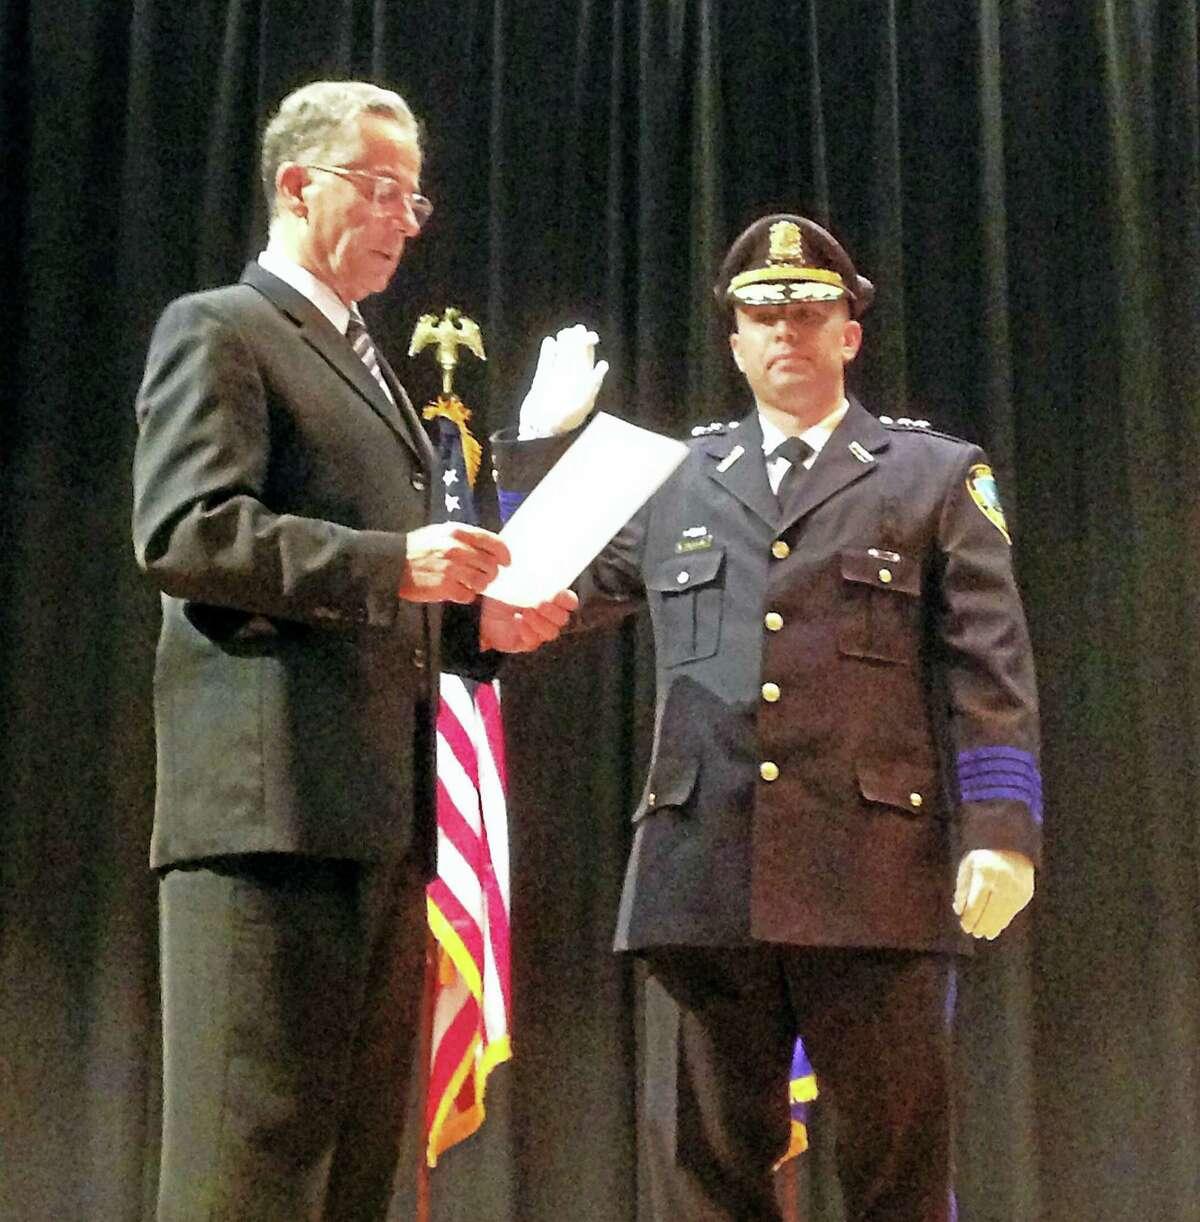 Mayor Joseph Maturo swears in Ed Lennon as chief of police of East Haven Thursday at the Joseph Melillo Middle School Auditorium.